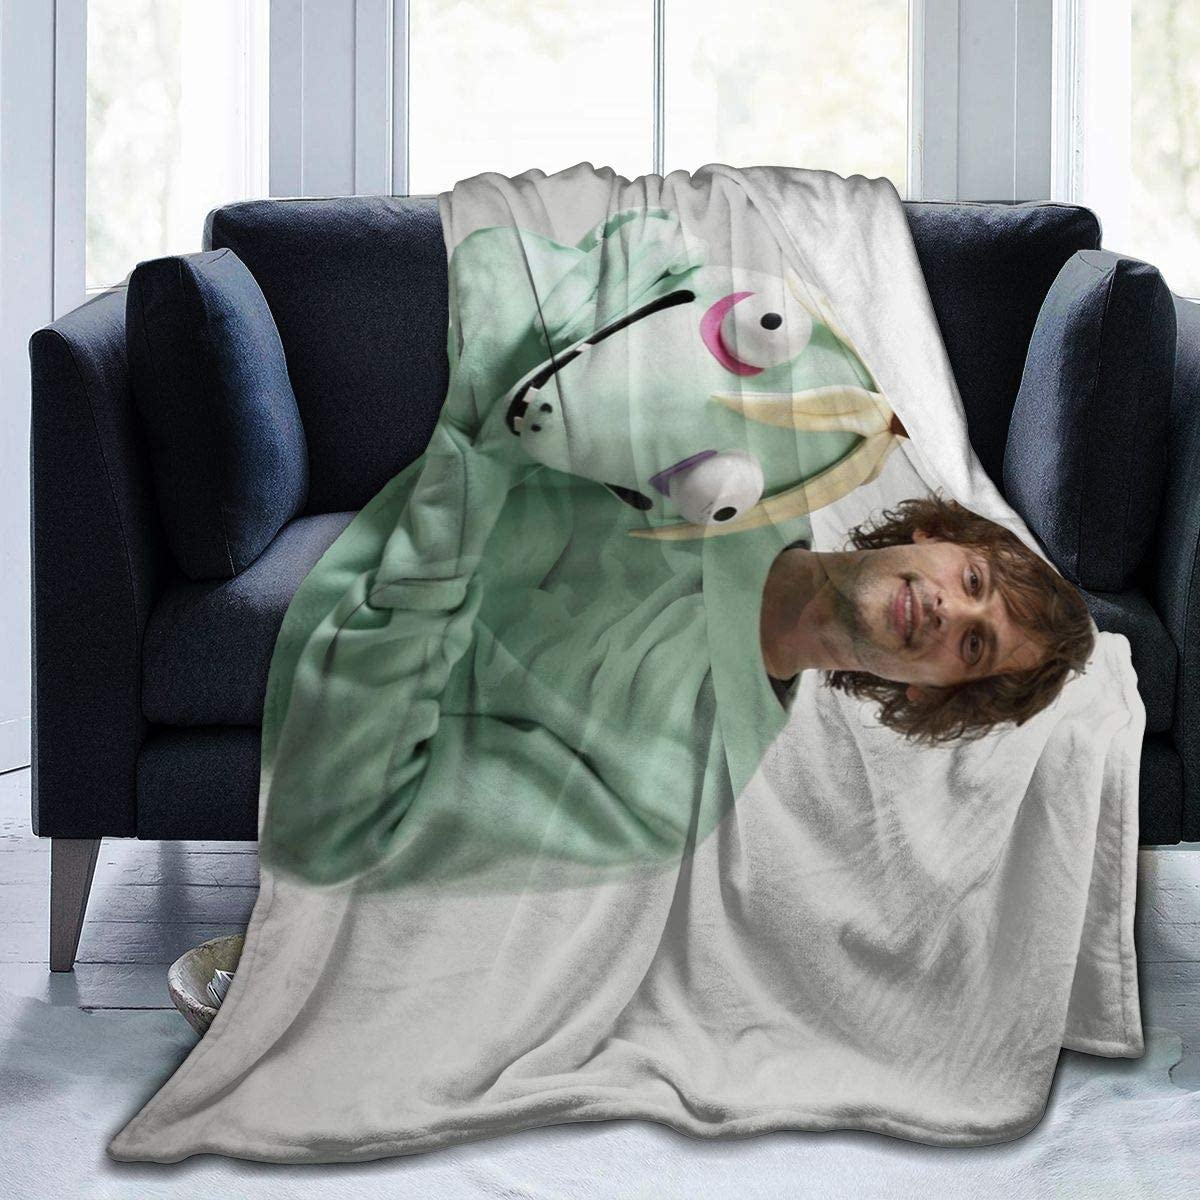 Sadie Mae Matt-hew Flannel Fleece Blanket Lightweight Soft Warm Cozy Throw Blanket Home Decor for Couch, Bed, Sofa, Travel 50x40inch